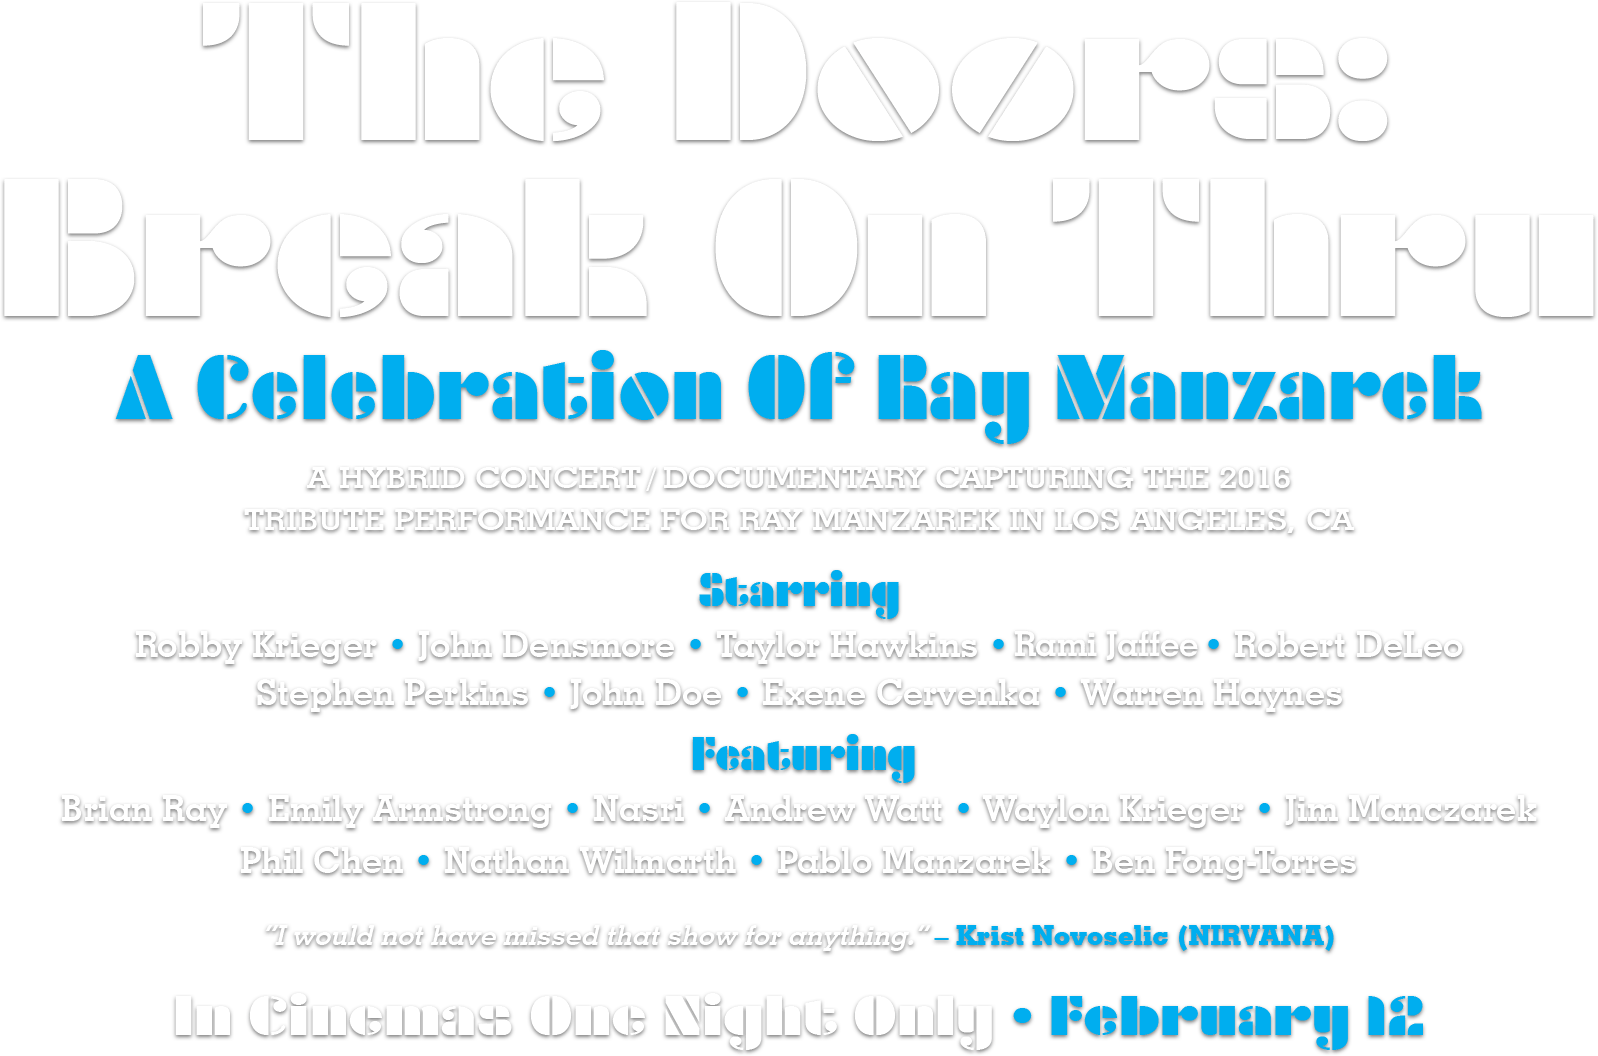 THE DOORS: BREAK ON THRU – A CELEBRATION OF RAY MANZAREK: Synopsis | Trafalgar Releasing